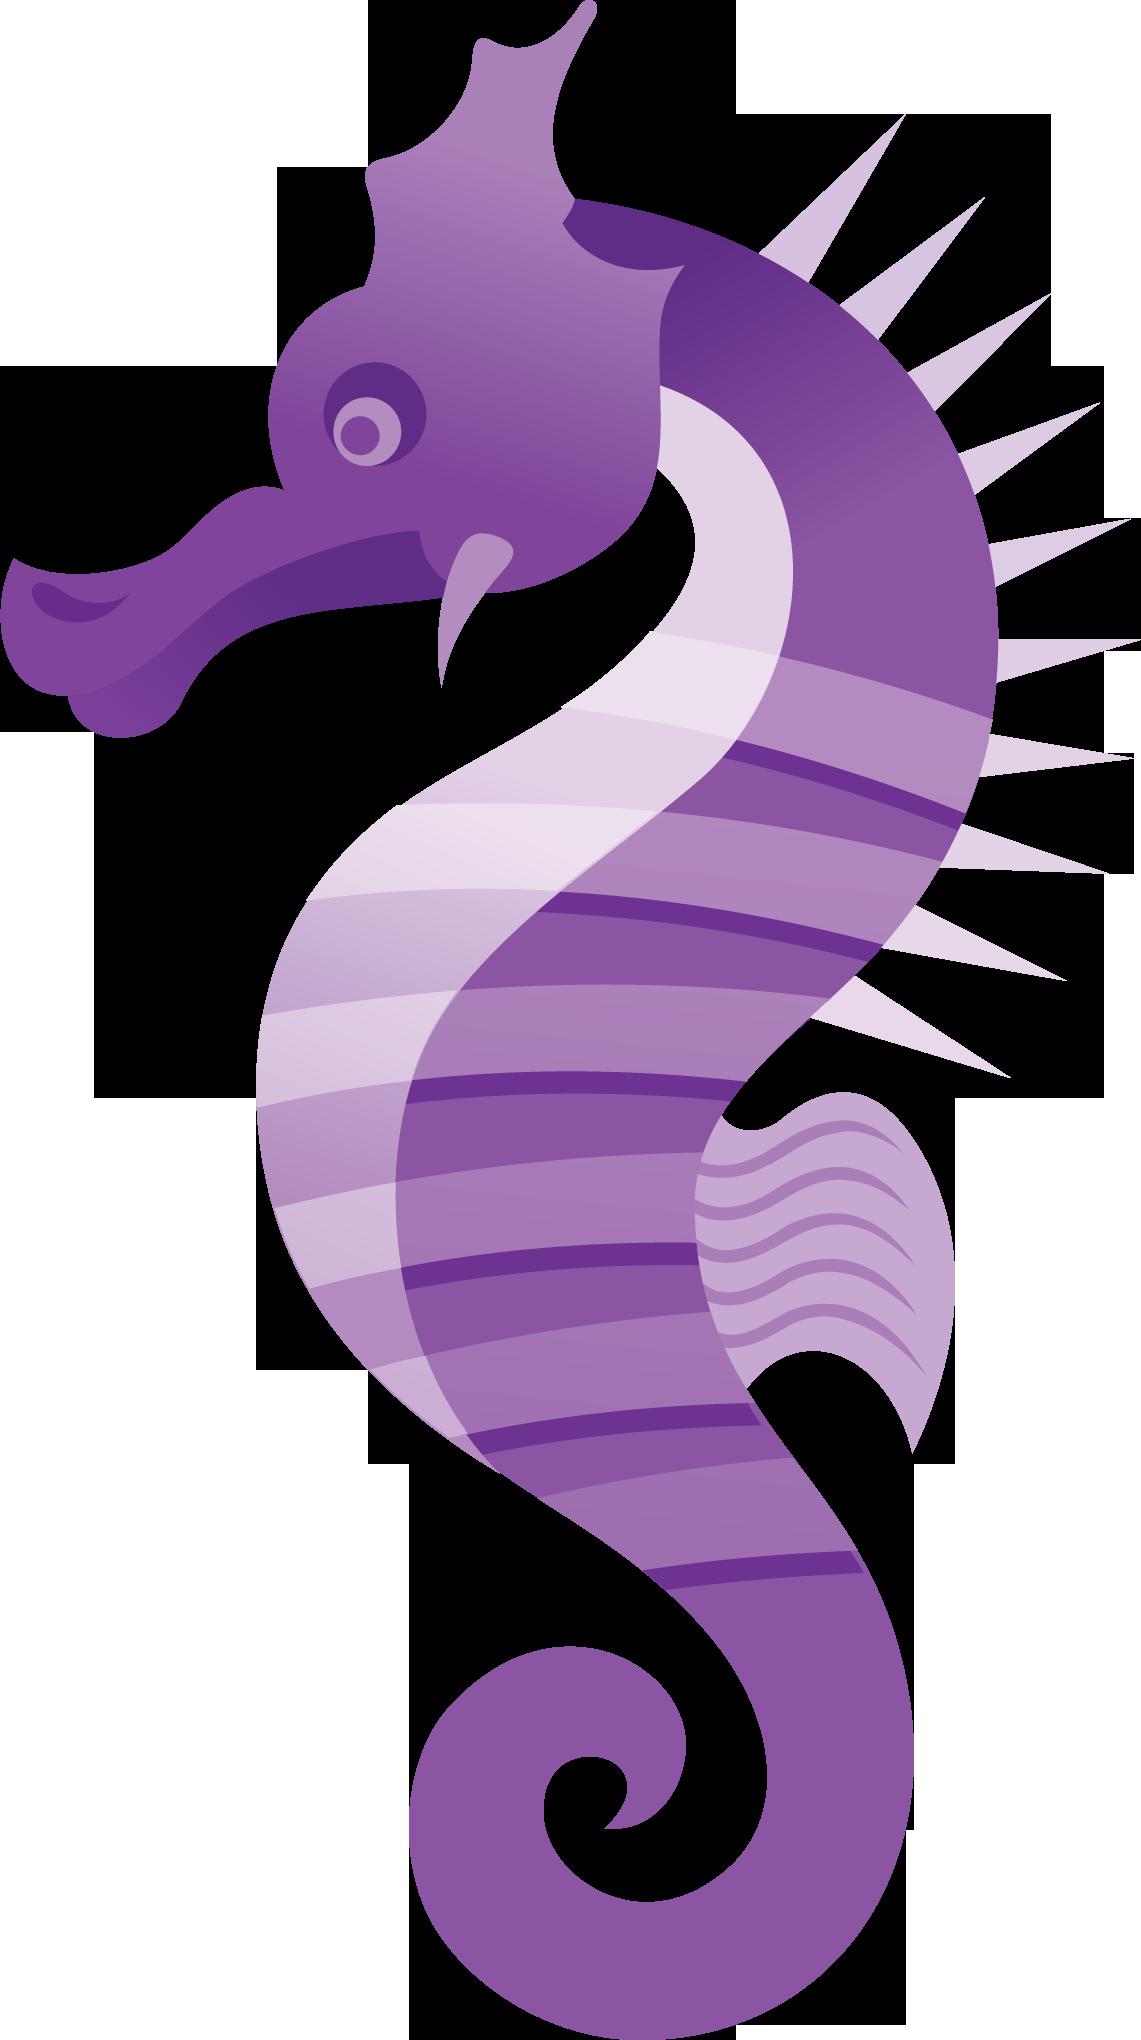 Ocean clipart seahorse. Morkon png animal planet